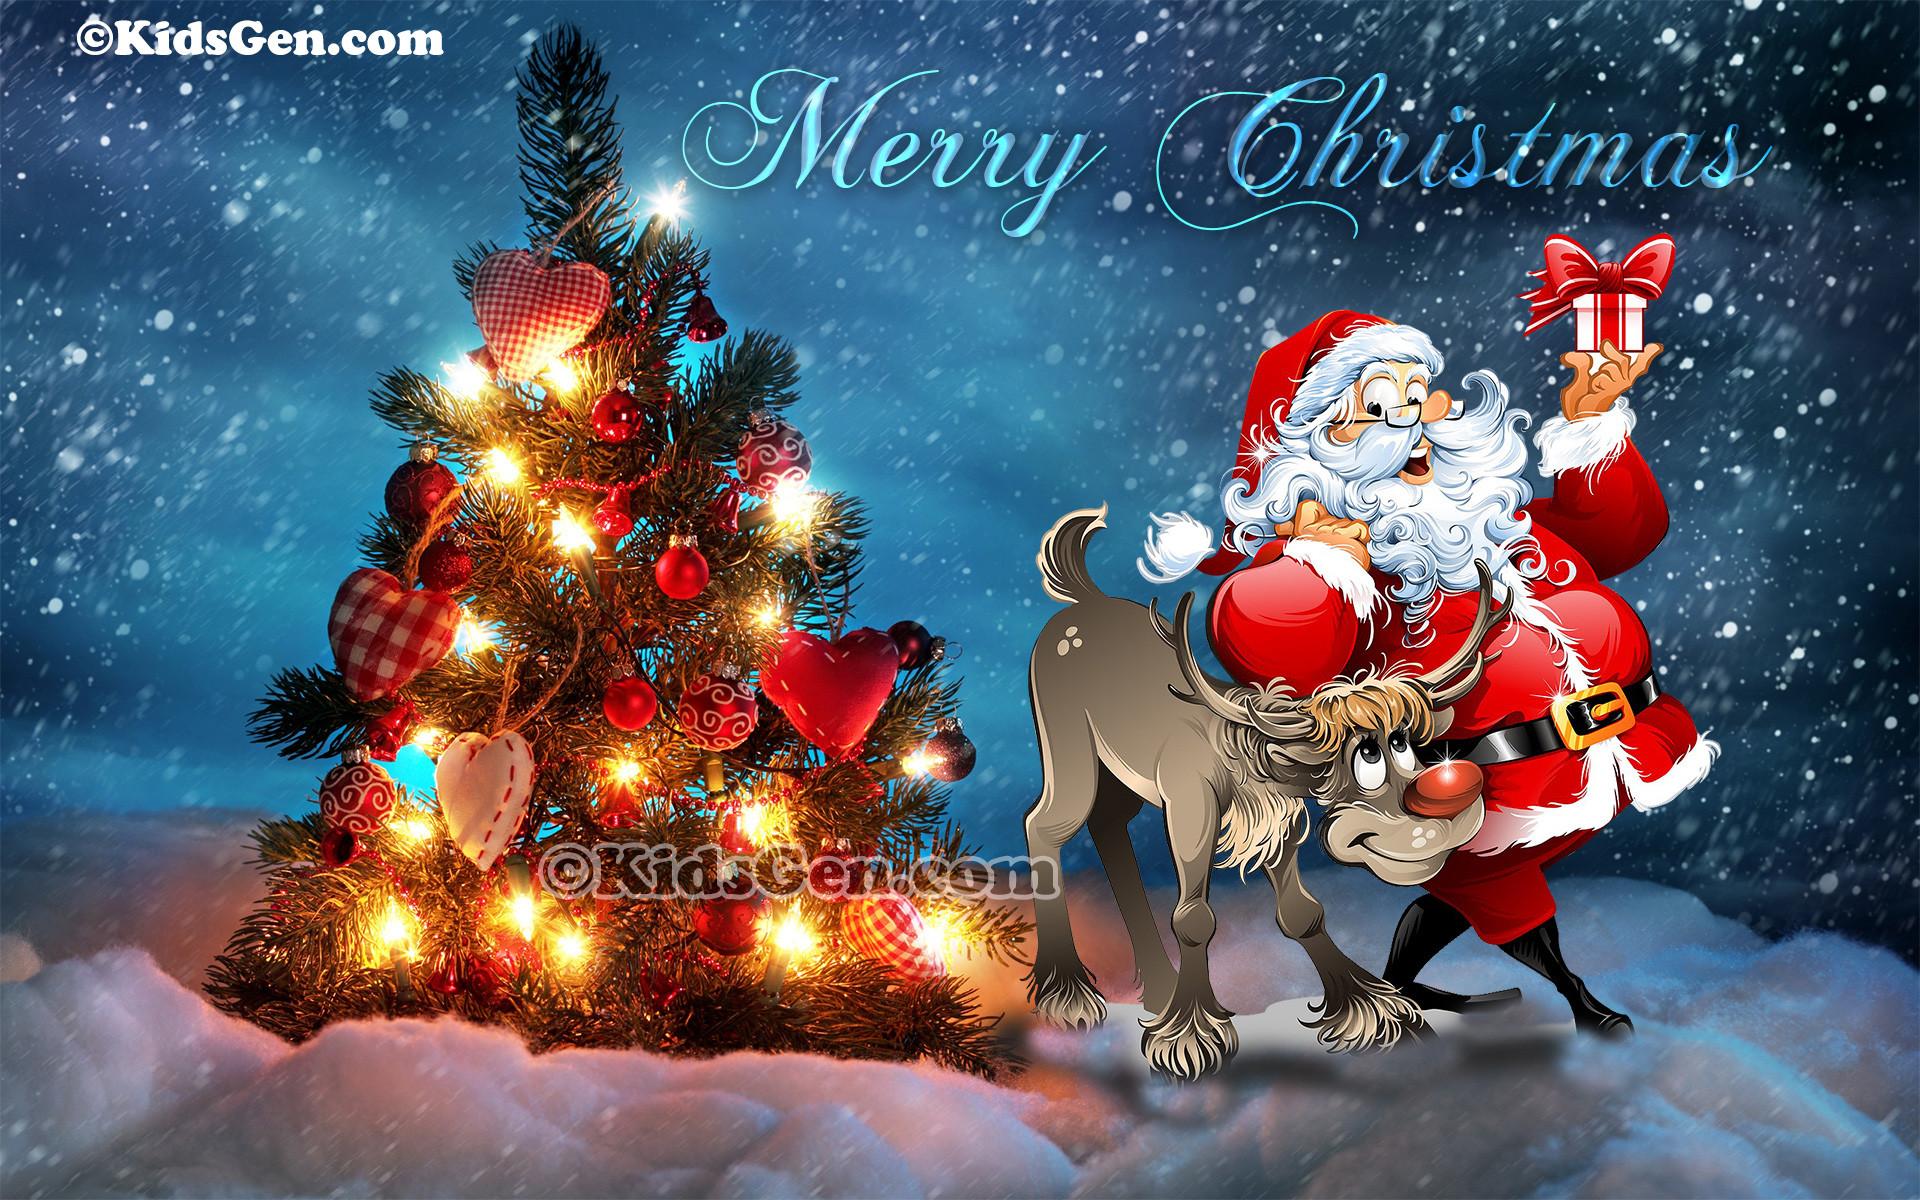 Santa and Baby Jesus Wallpaper 59 images